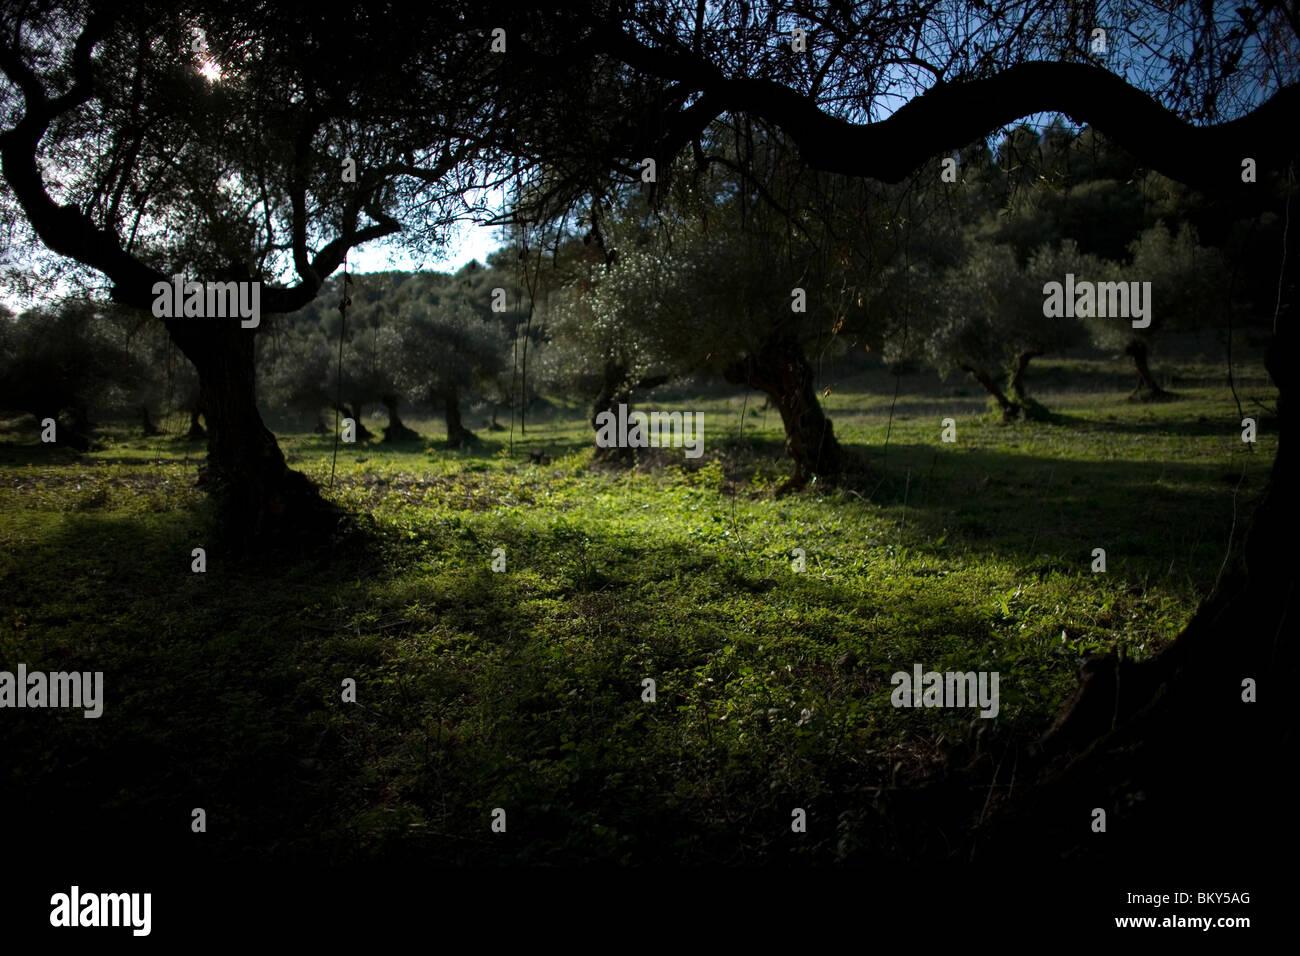 Olive trees in a rural path in El Bosque, Cadiz Province, Spain, March 12, 2008.Photo/Chico Sanchez Stock Photo